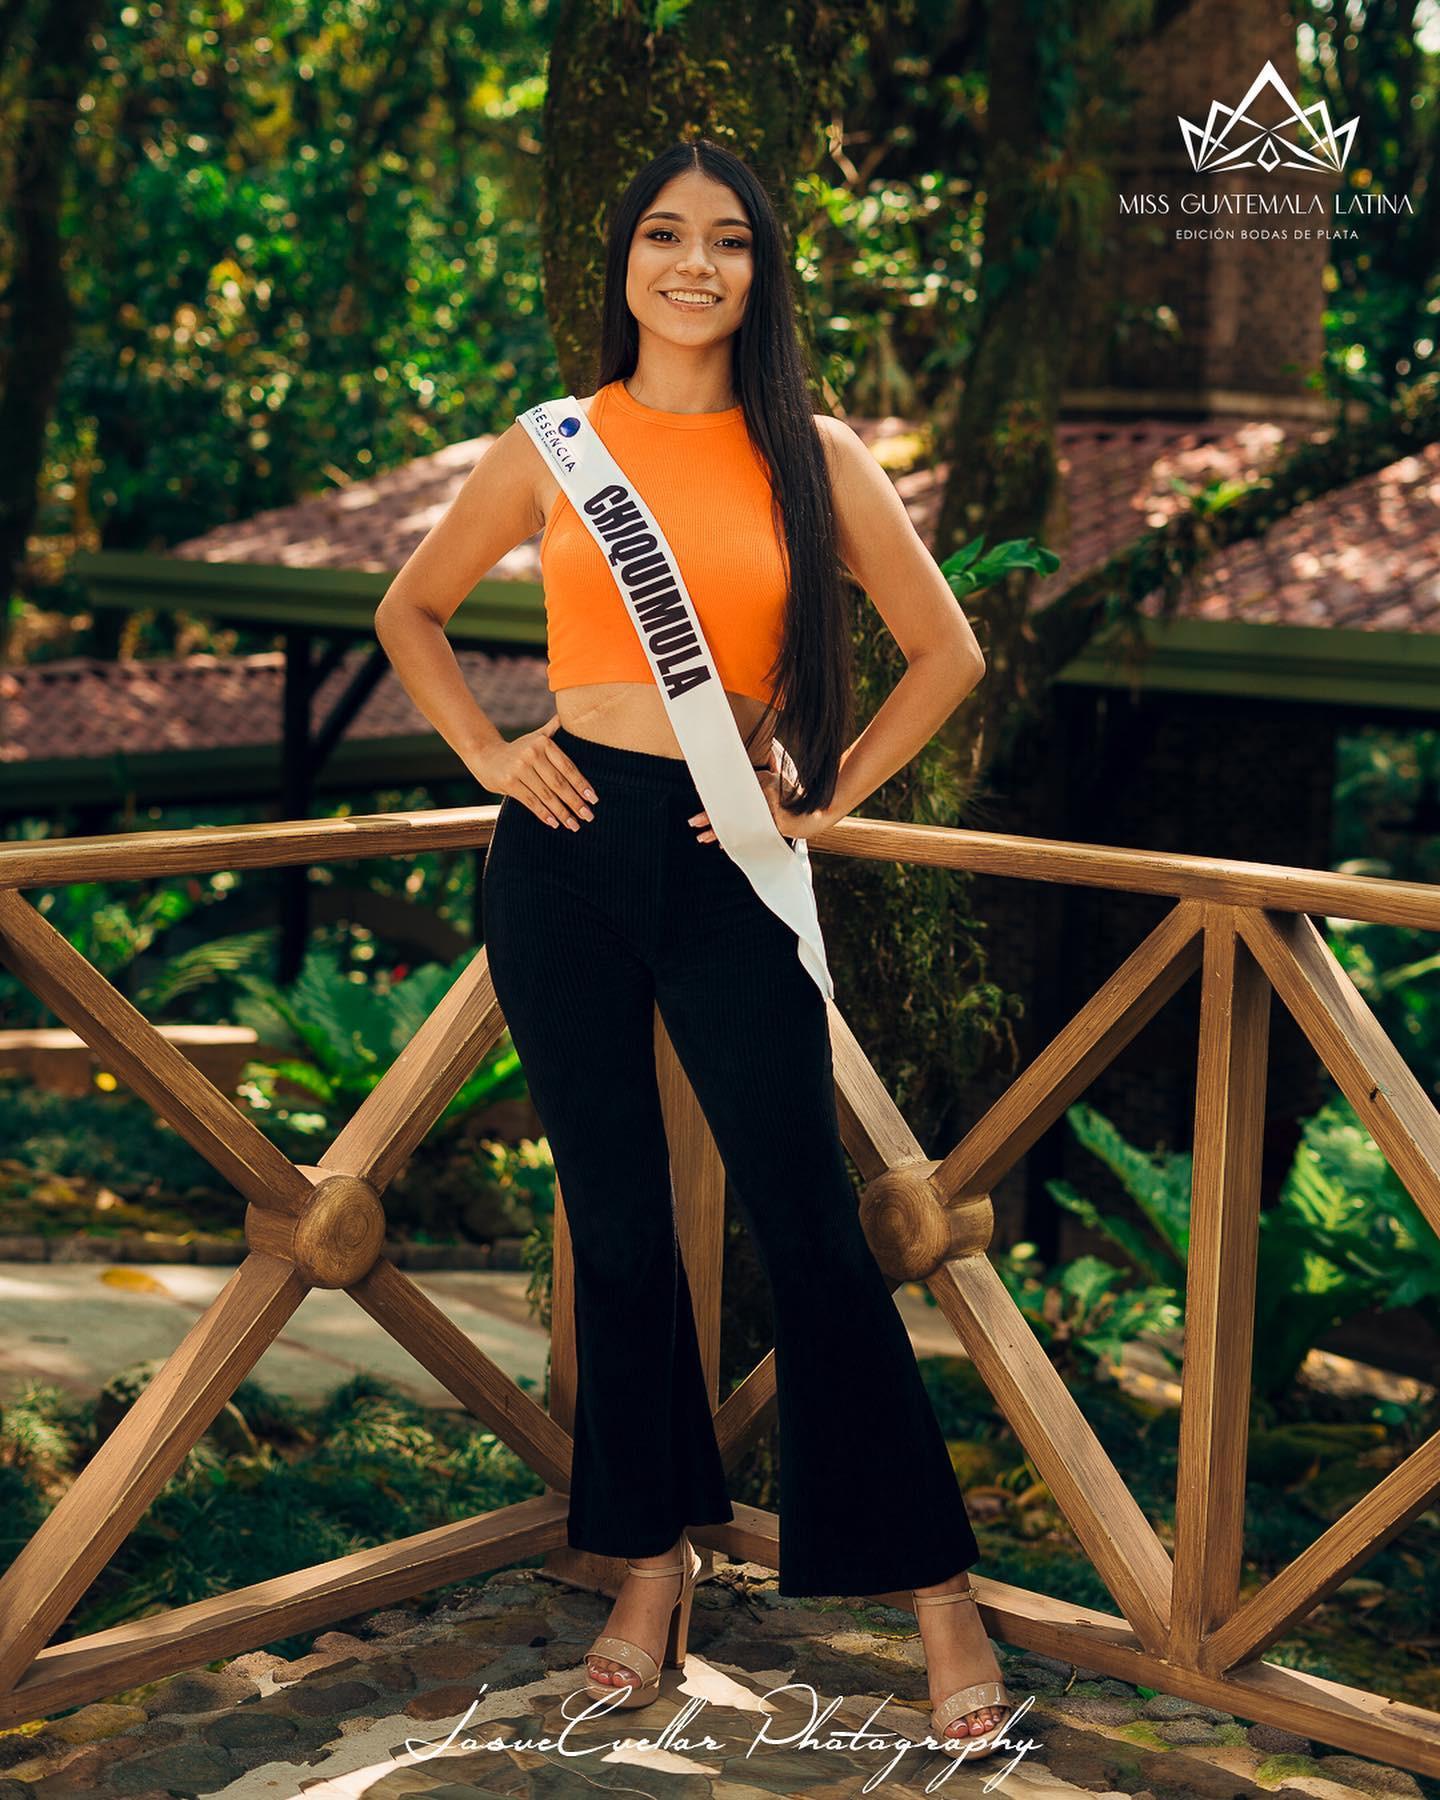 candidatas a miss guatemala latina 2021. final: 30 de abril. - Página 7 BFjXPp